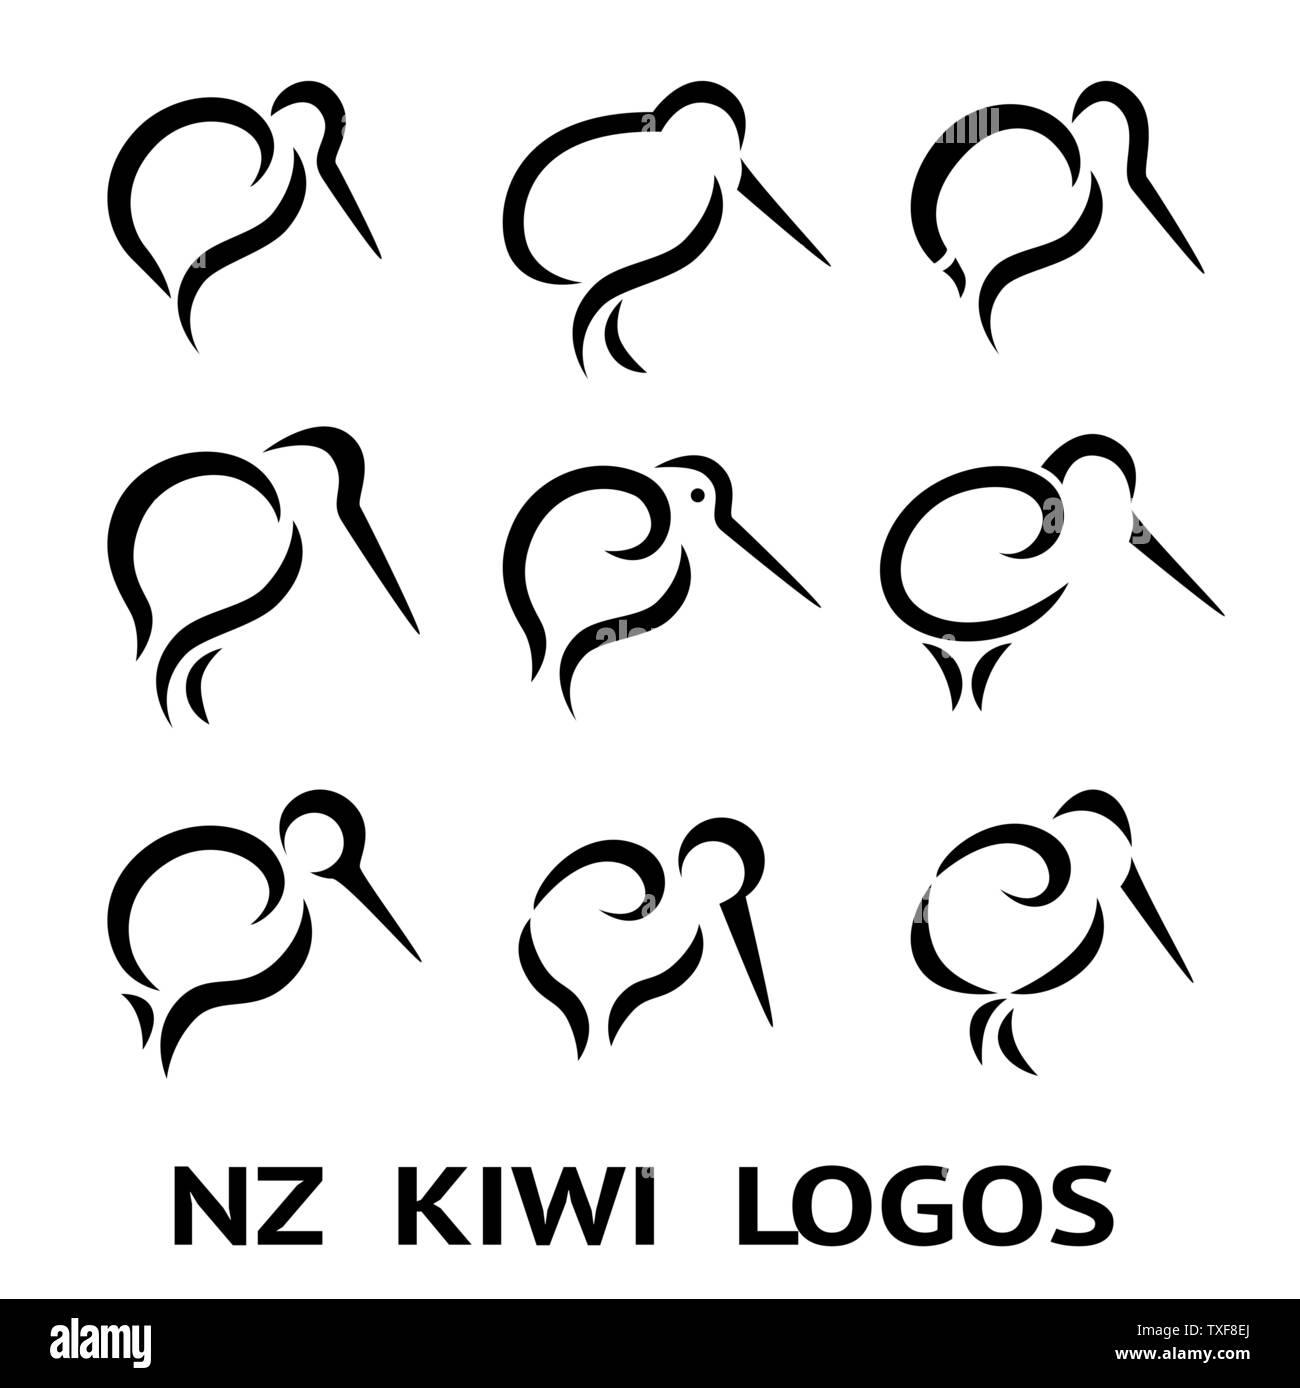 New Zealand Kiwi Bird Logo or tattoo with Maori Style Koru icon Design grouped - Stock Image